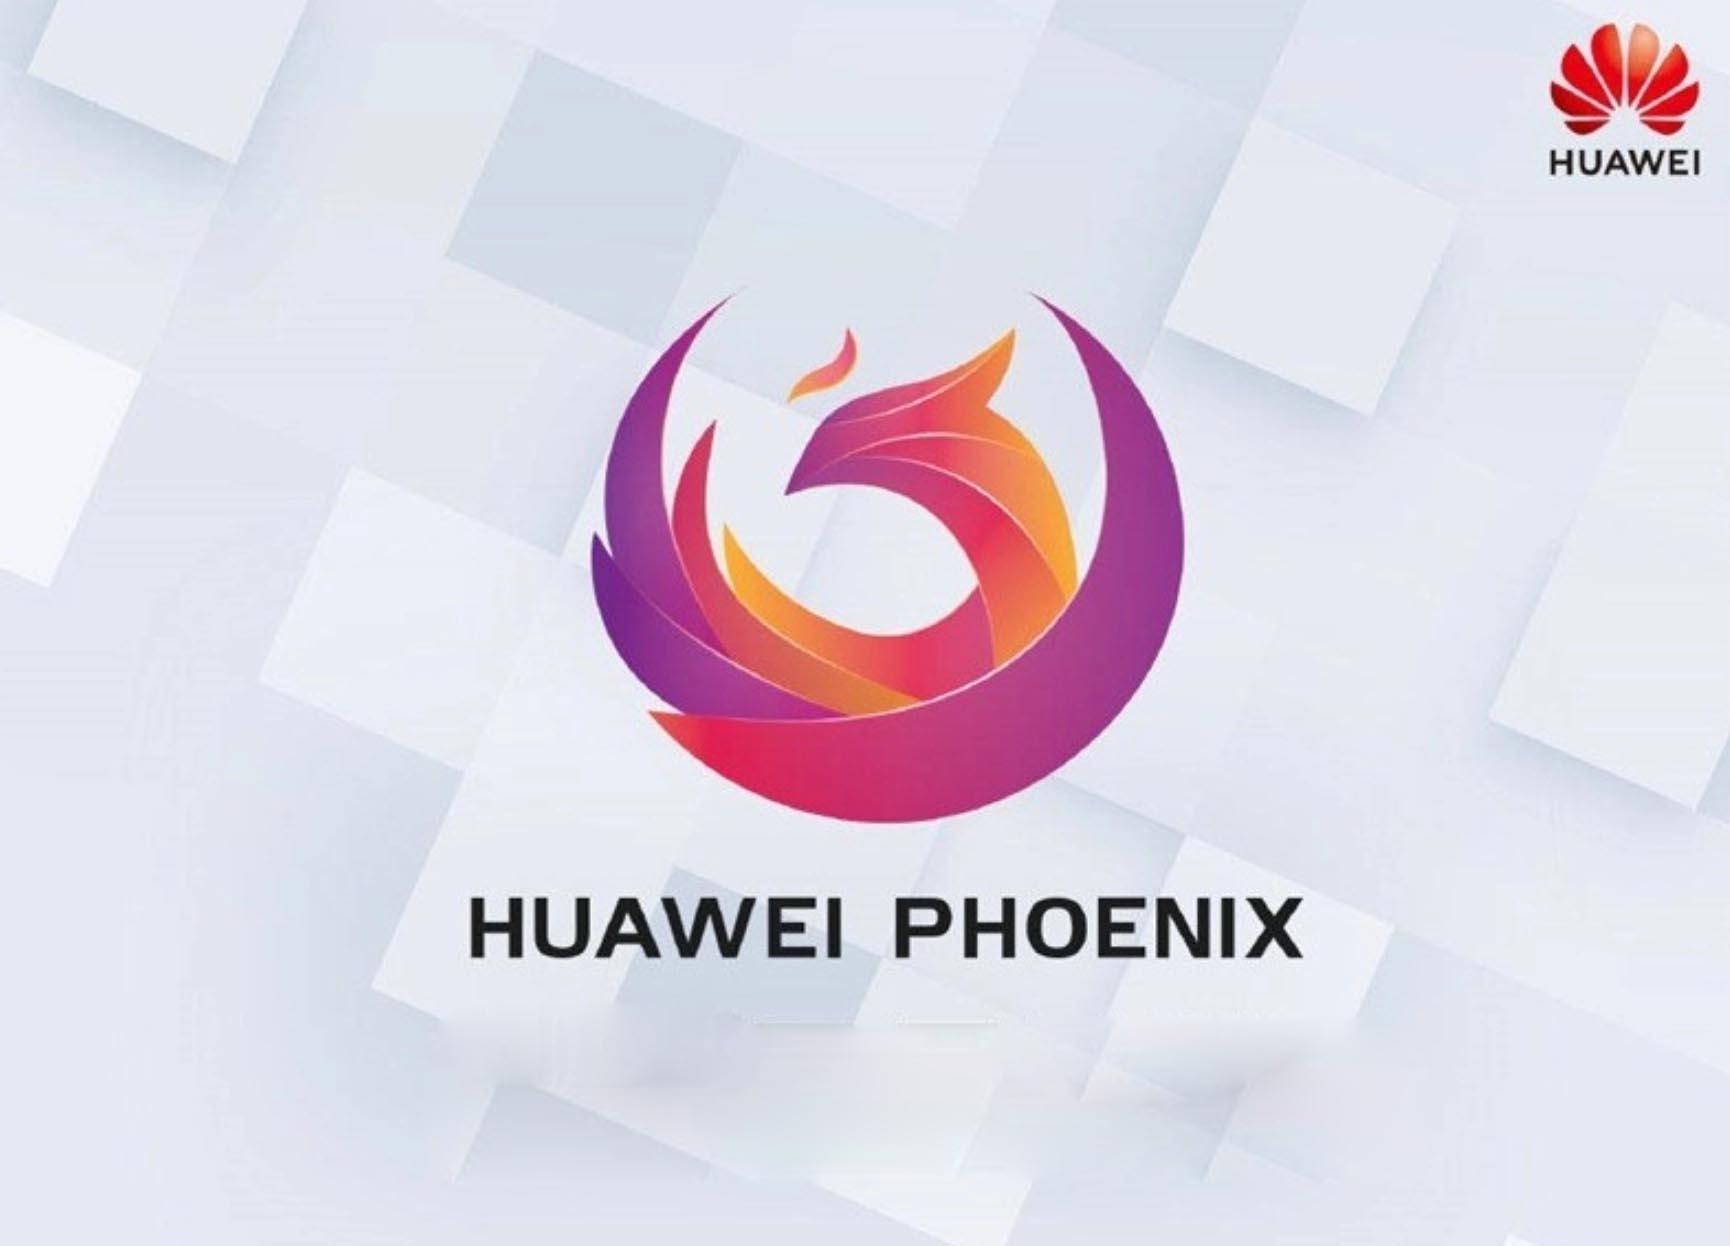 huawei-phonix.jpg